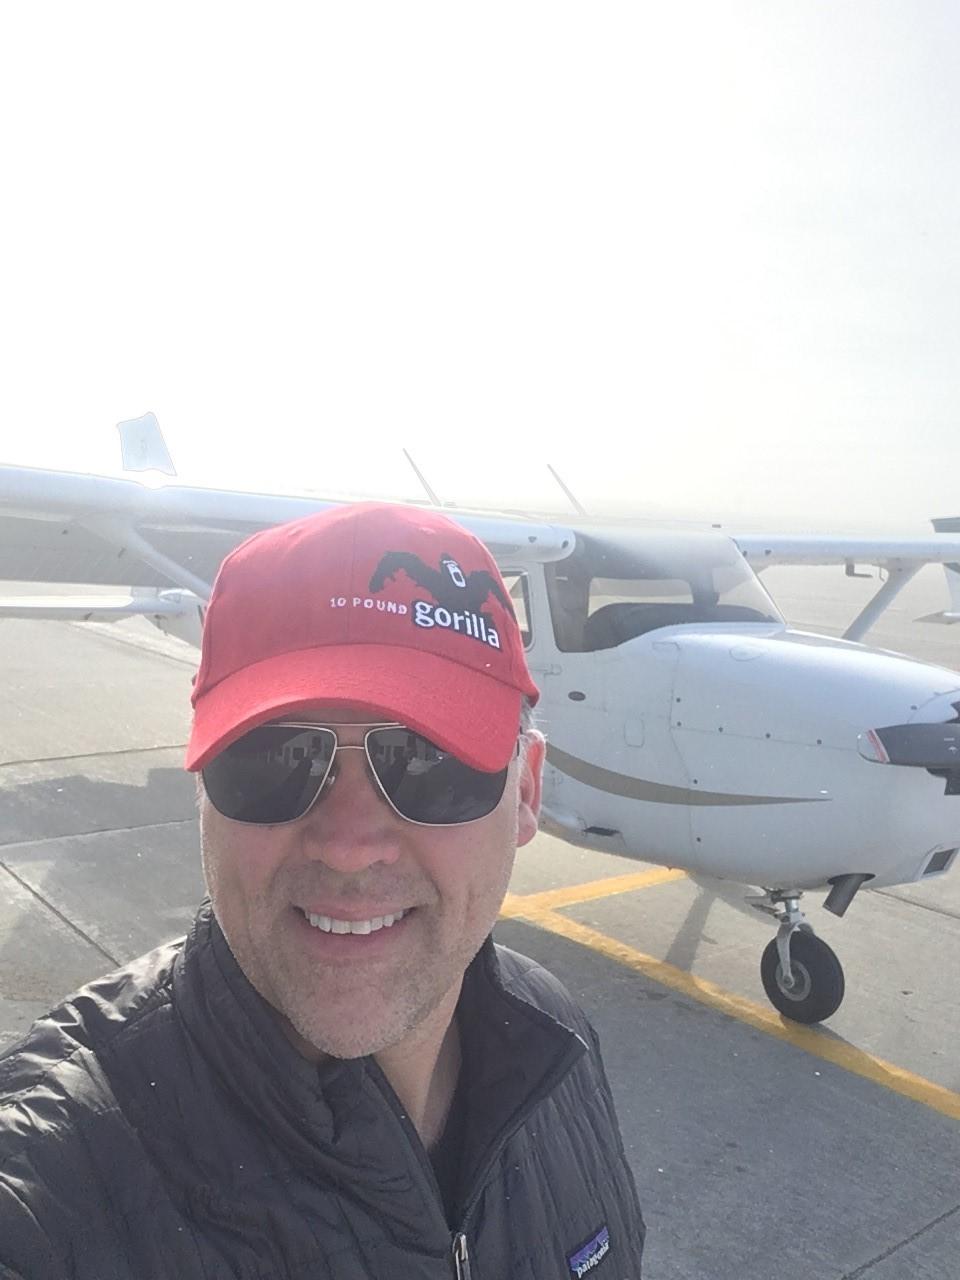 10 Pound Gorilla Hat with Pilot